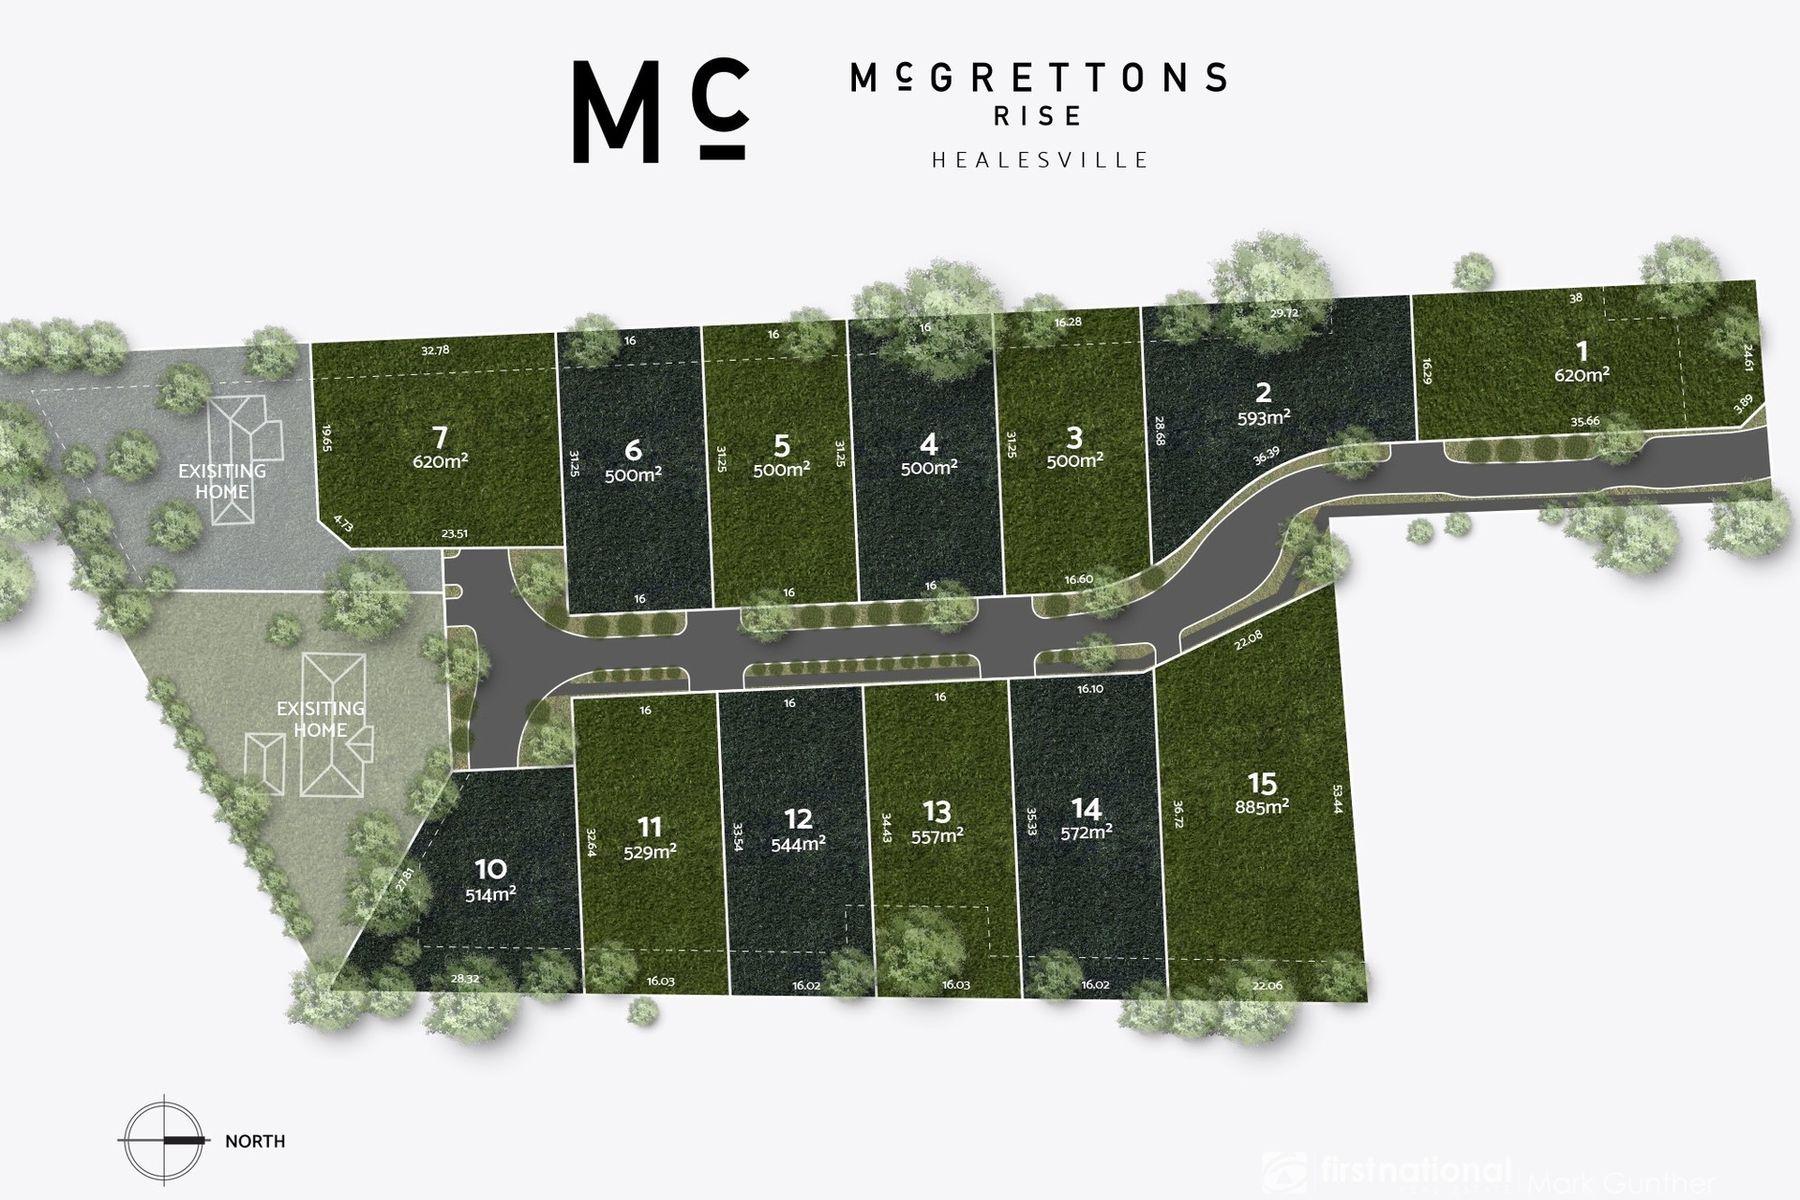 Lot 7/29 Mcgrettons Road, Healesville, VIC 3777